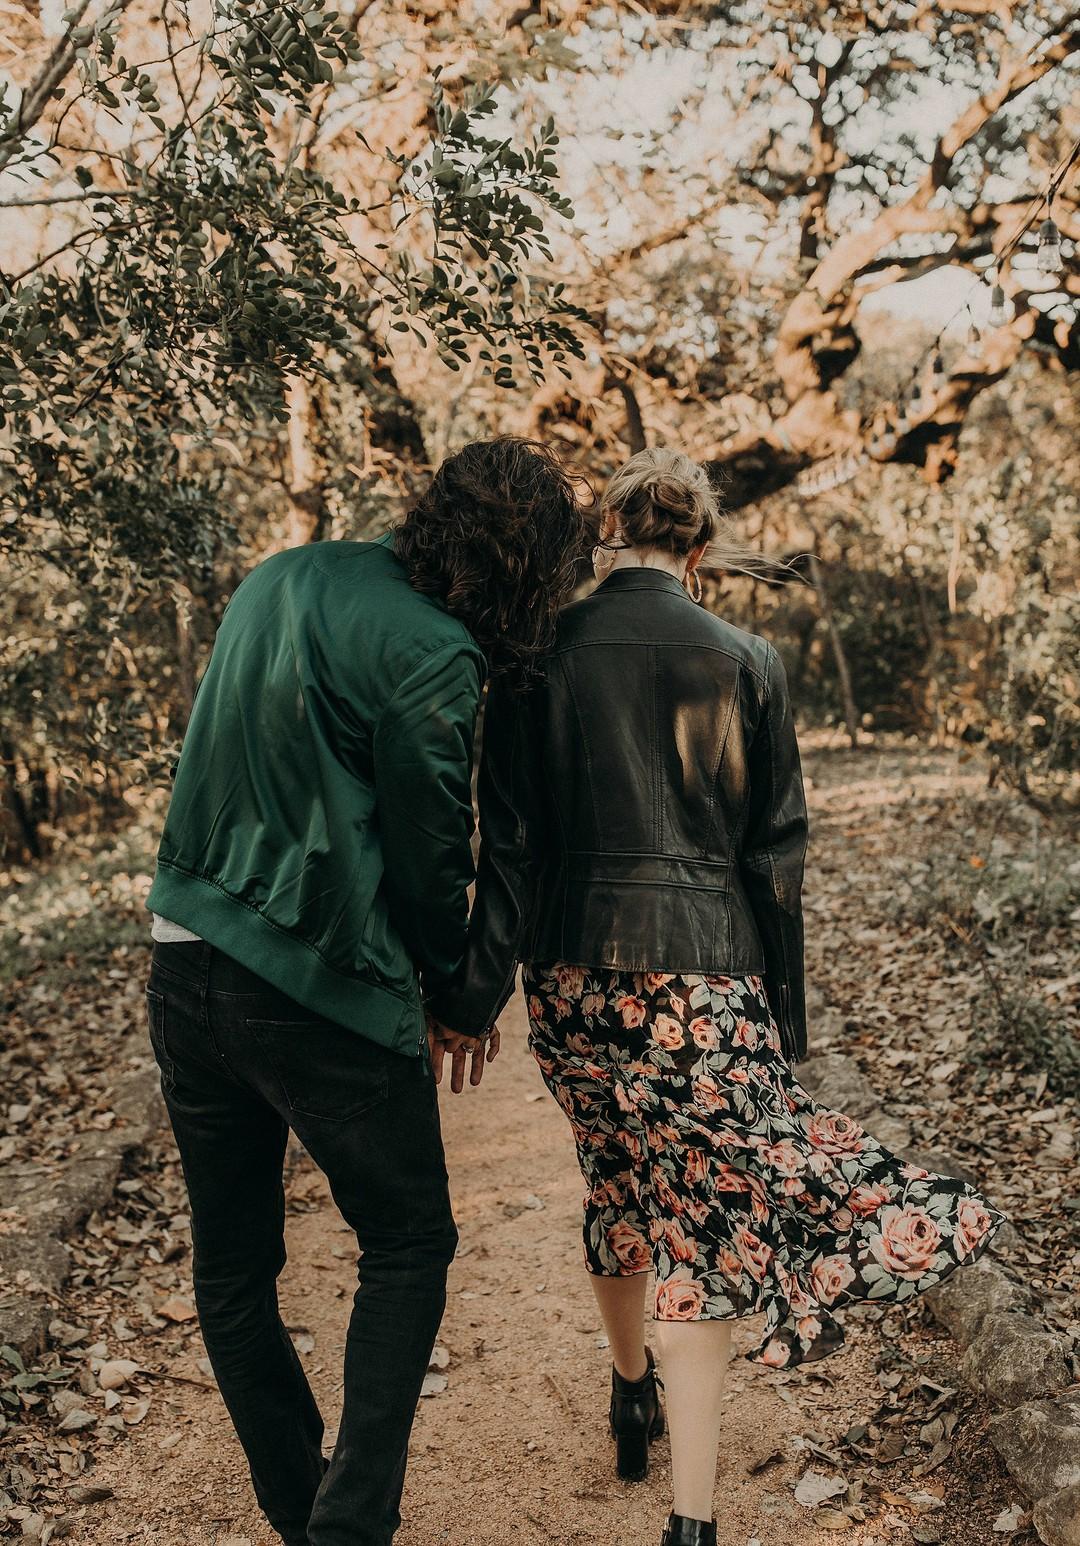 bröllop+inspiration+blogg